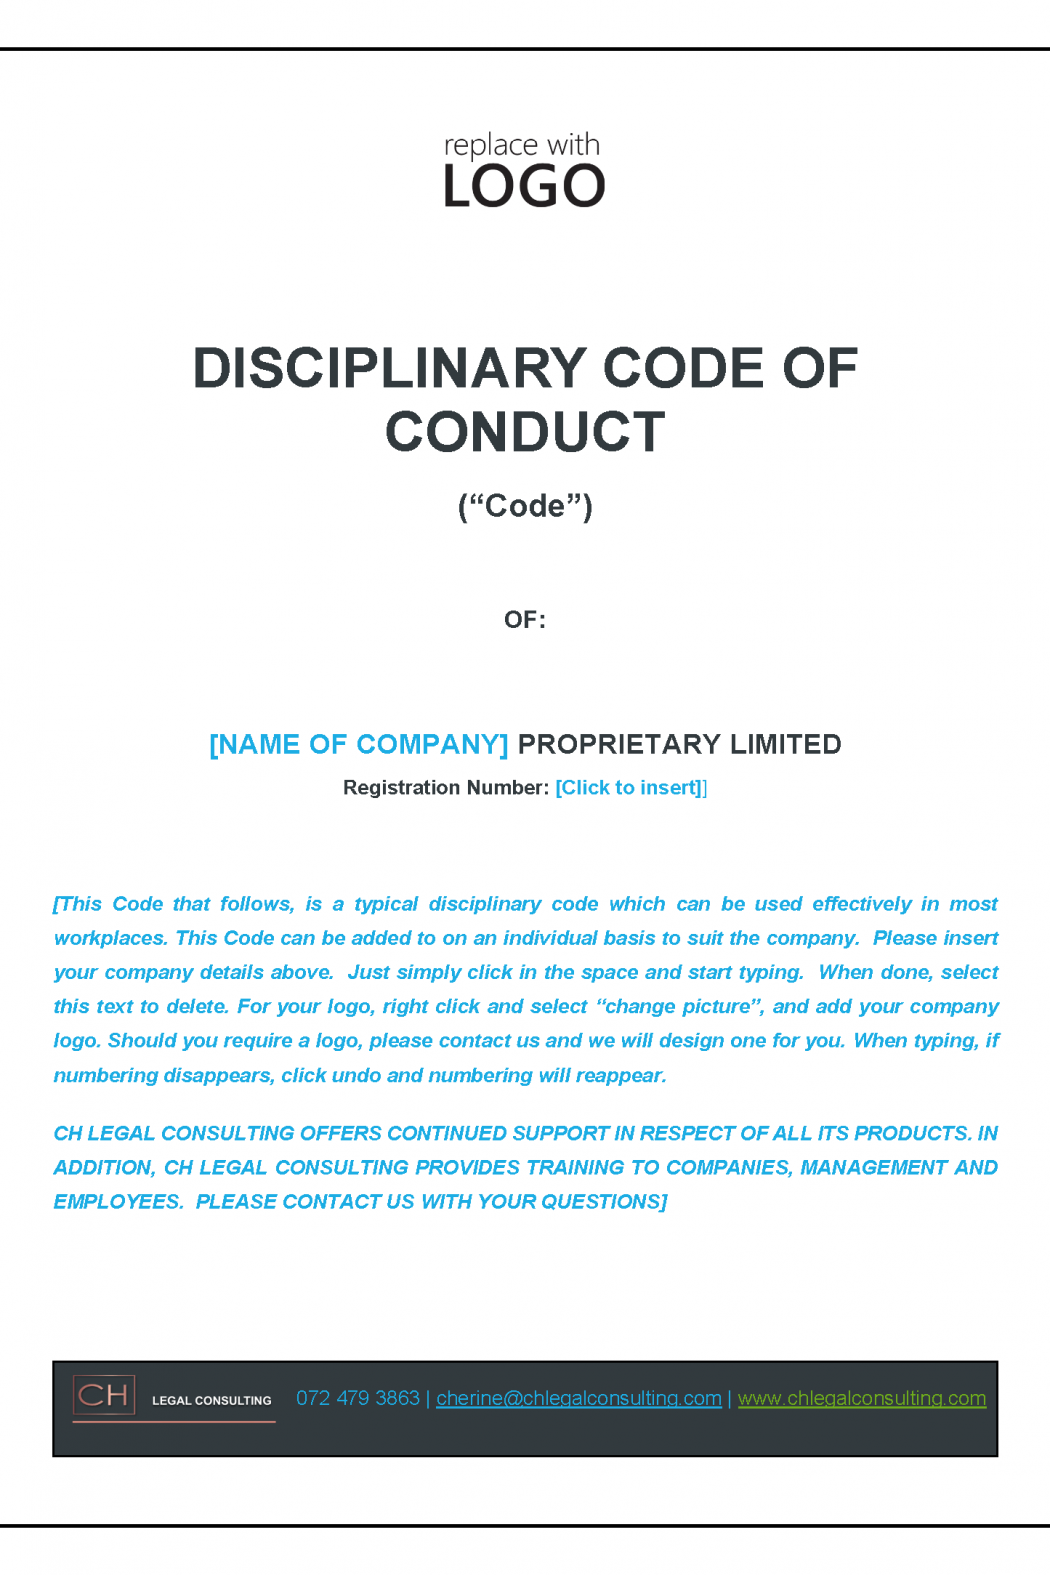 Disciplinary Code Precedent